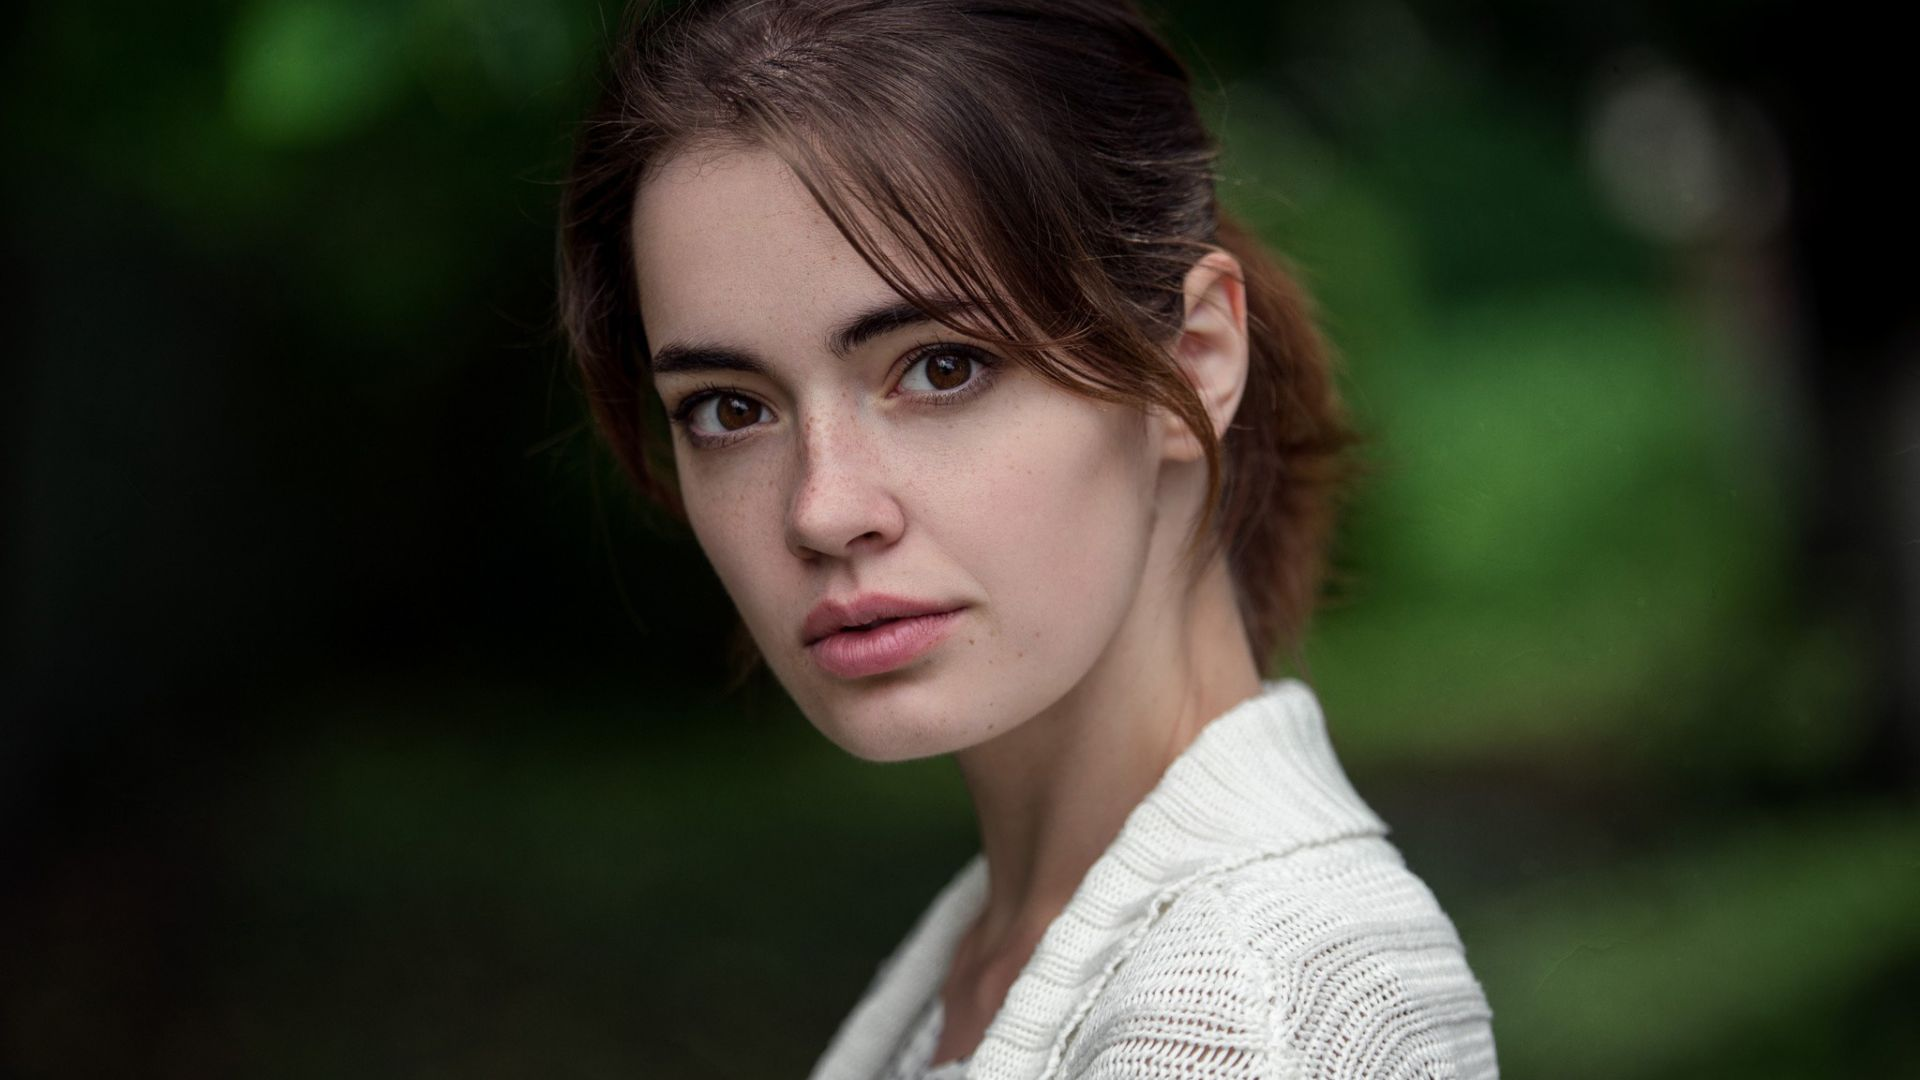 Wallpaper Lidia savoderova, face, brunette